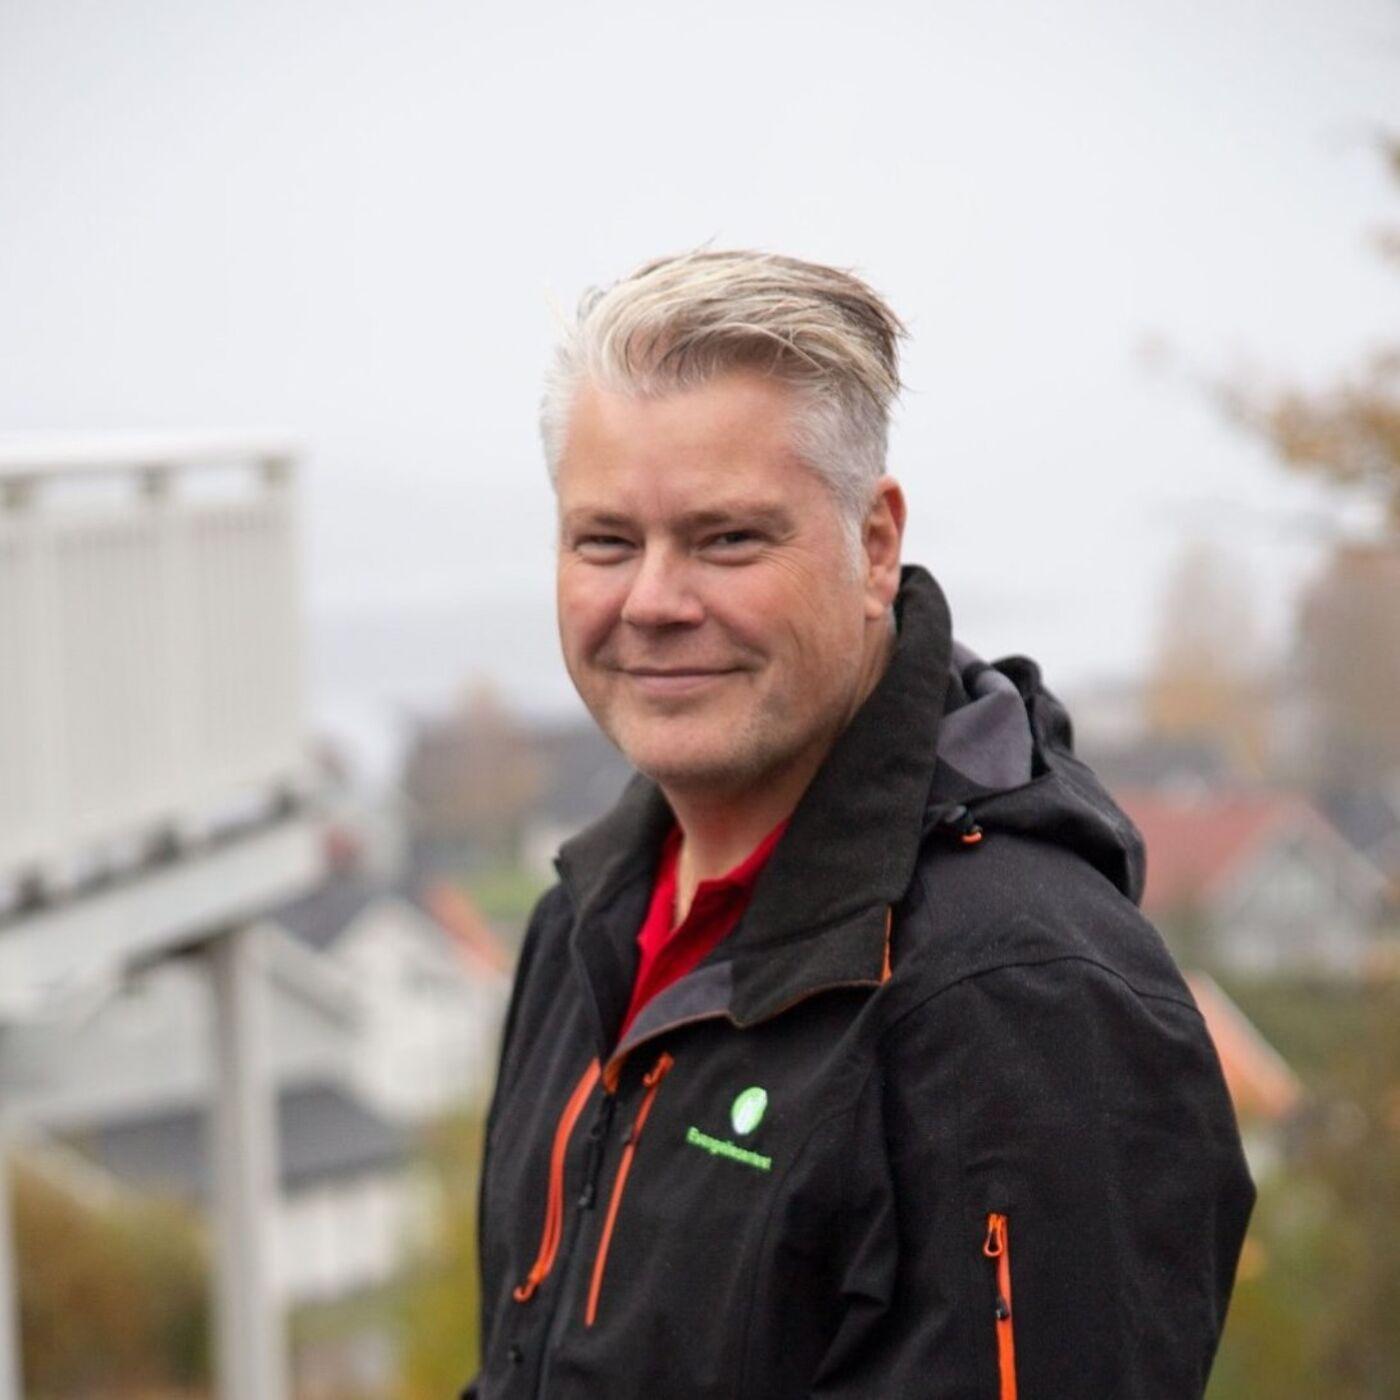 Stevne på Beitostølen / Pål Andre Joys Wigart